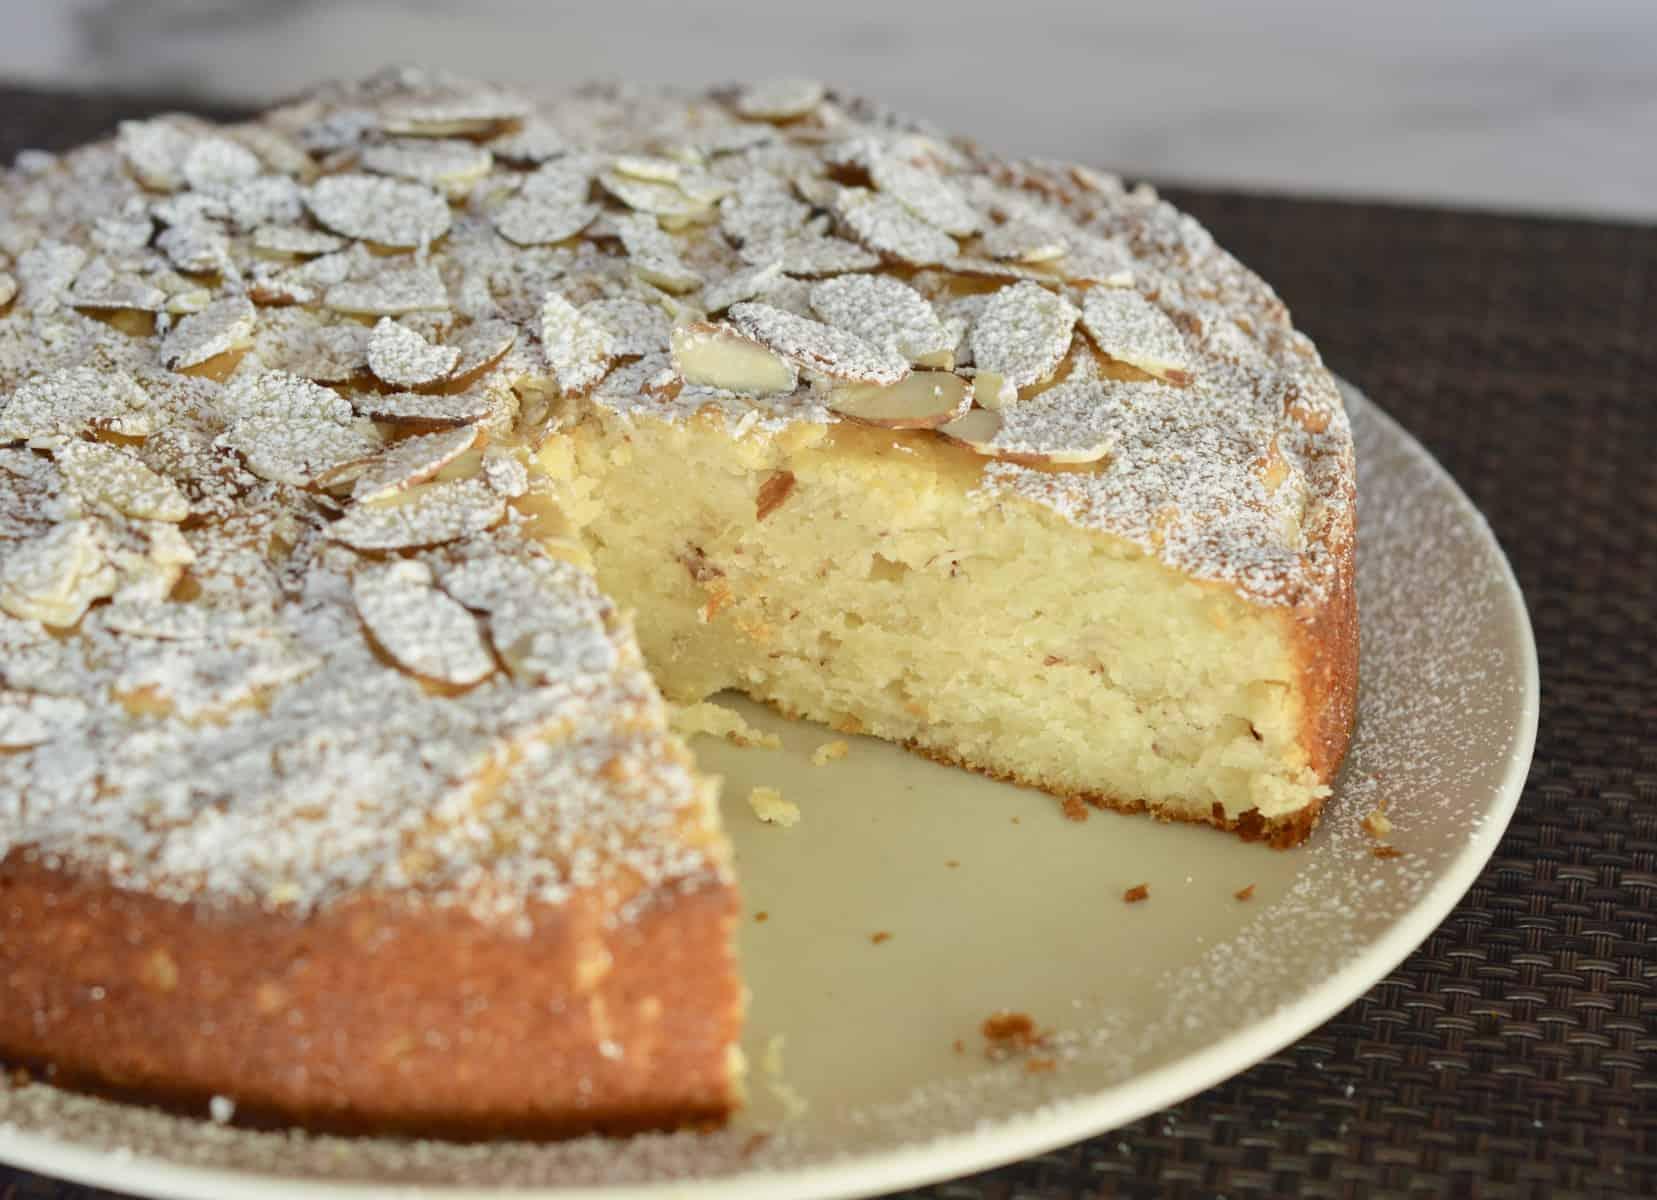 Almond Ricotta Cake Italian Dessert This Delicious House